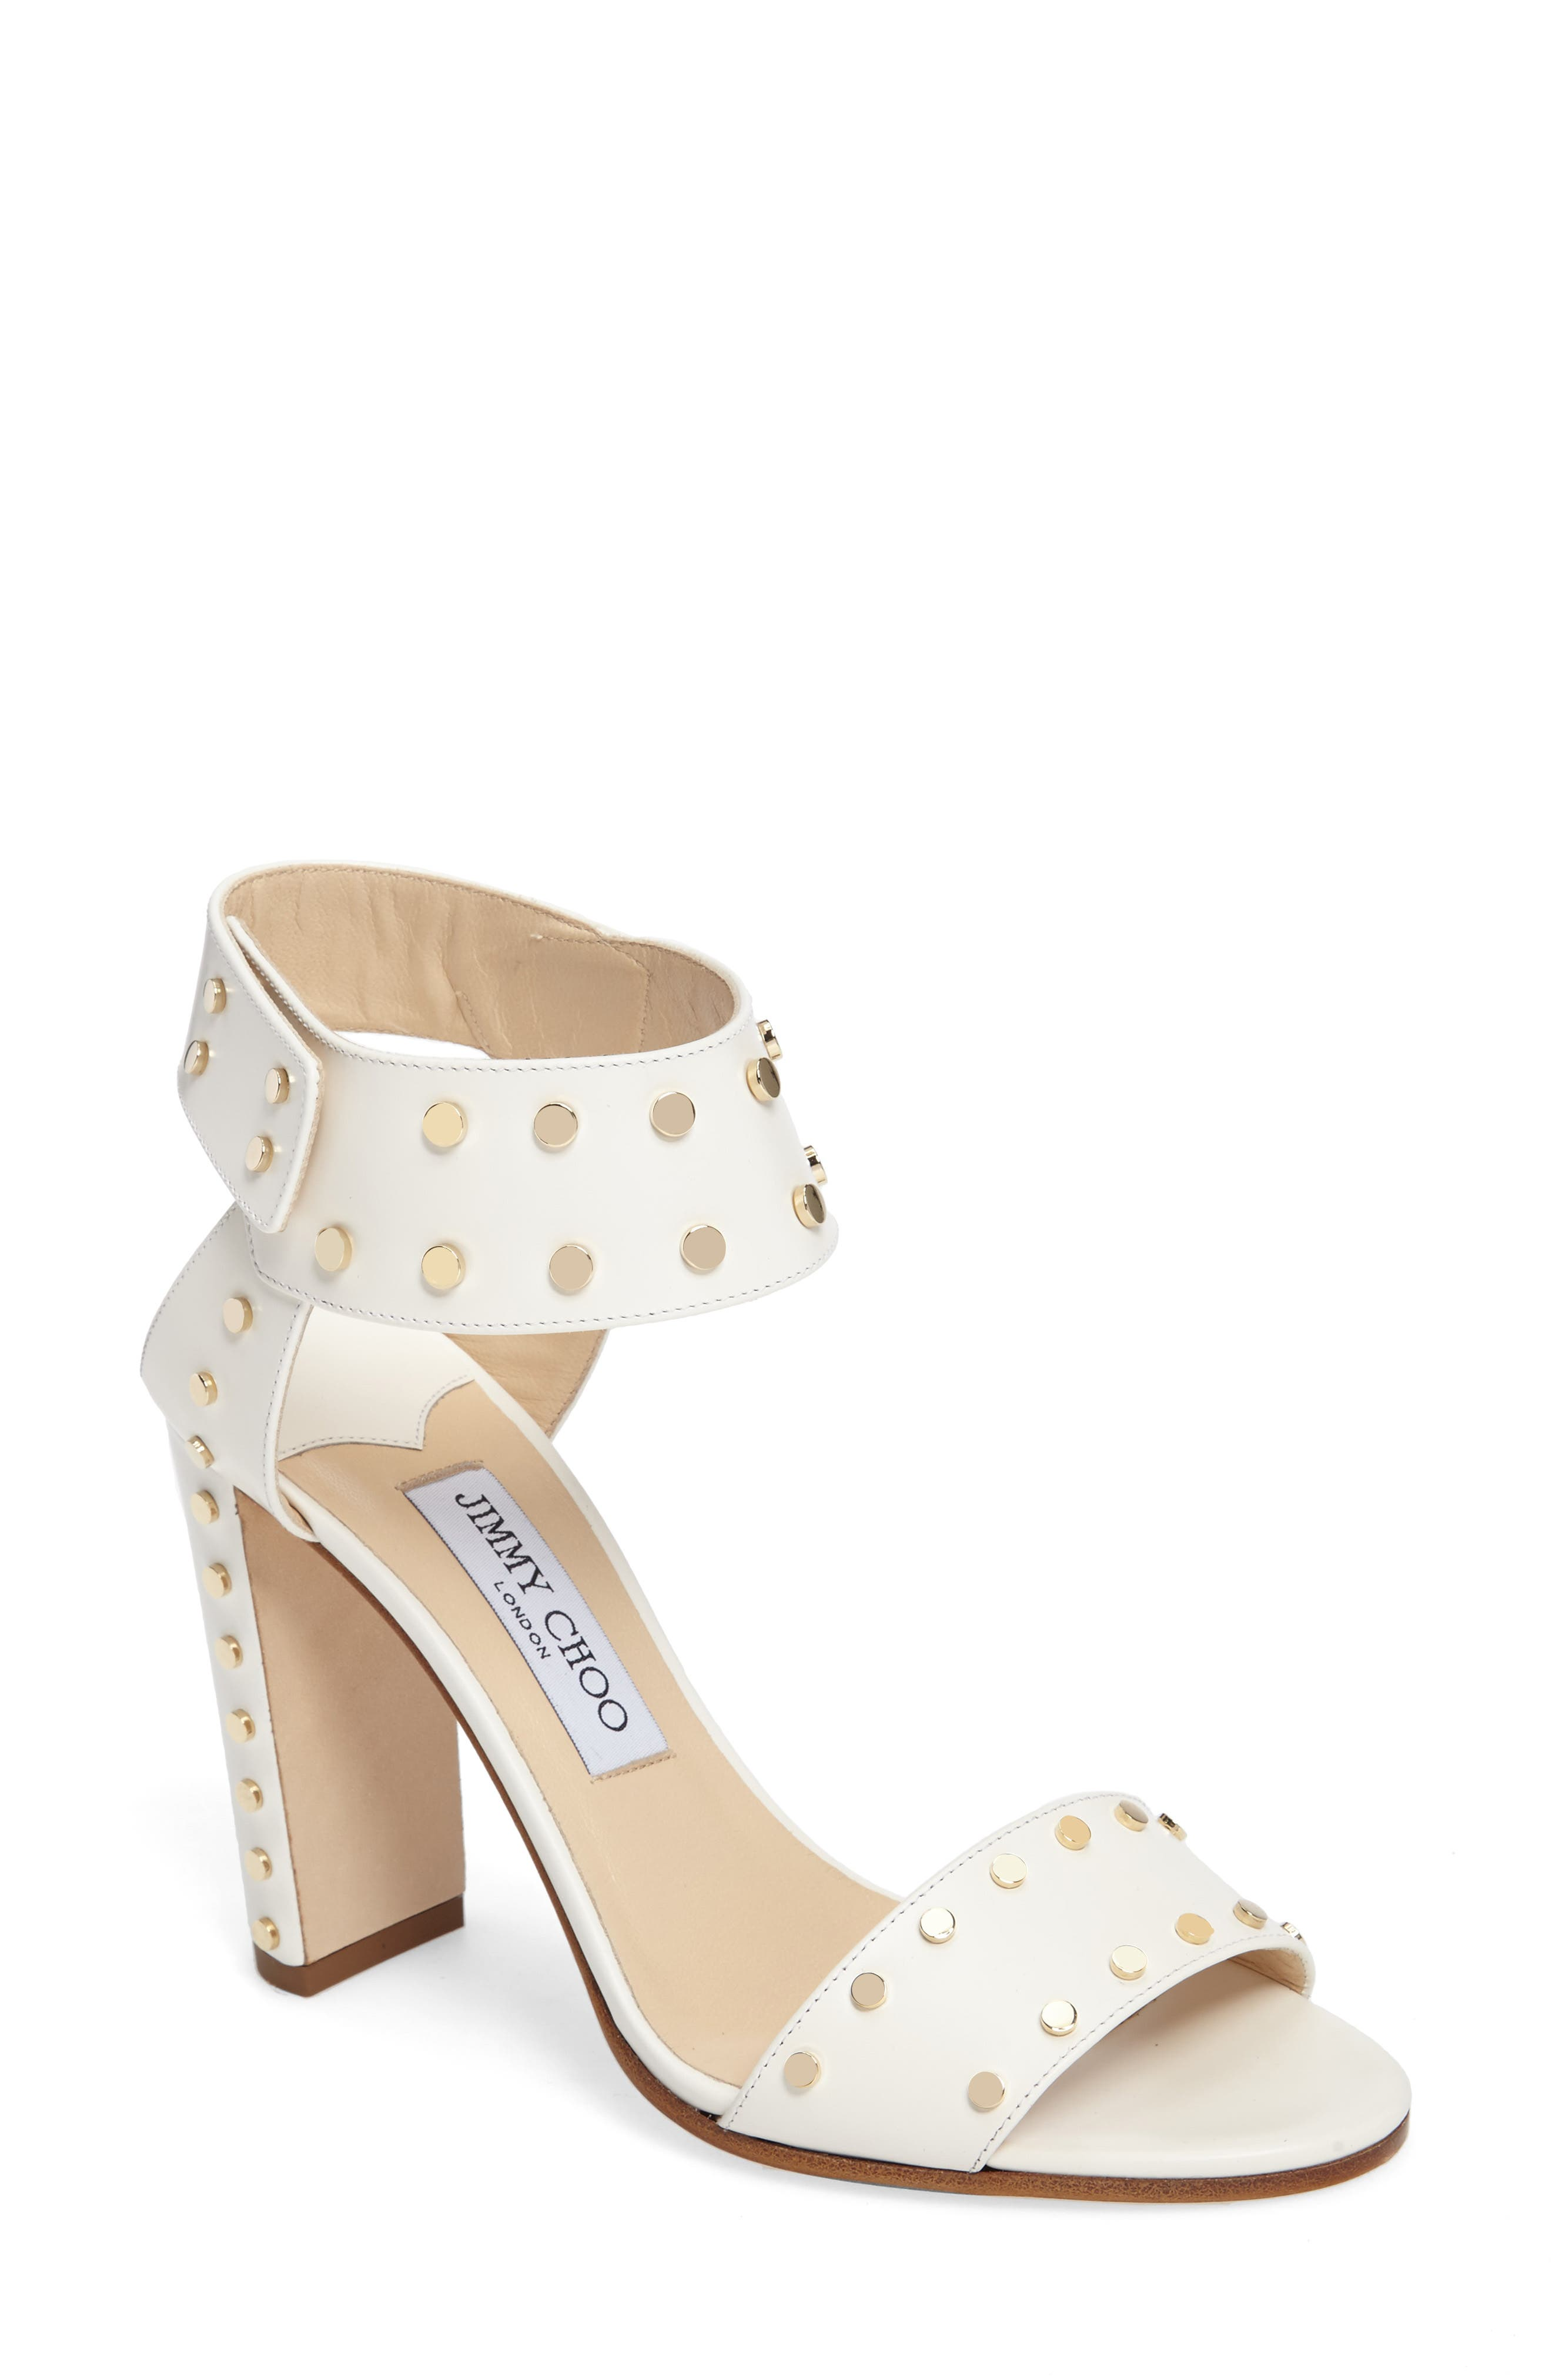 Main Image - Jimmy Choo Veto Studded Ankle Cuff Sandal (Women)